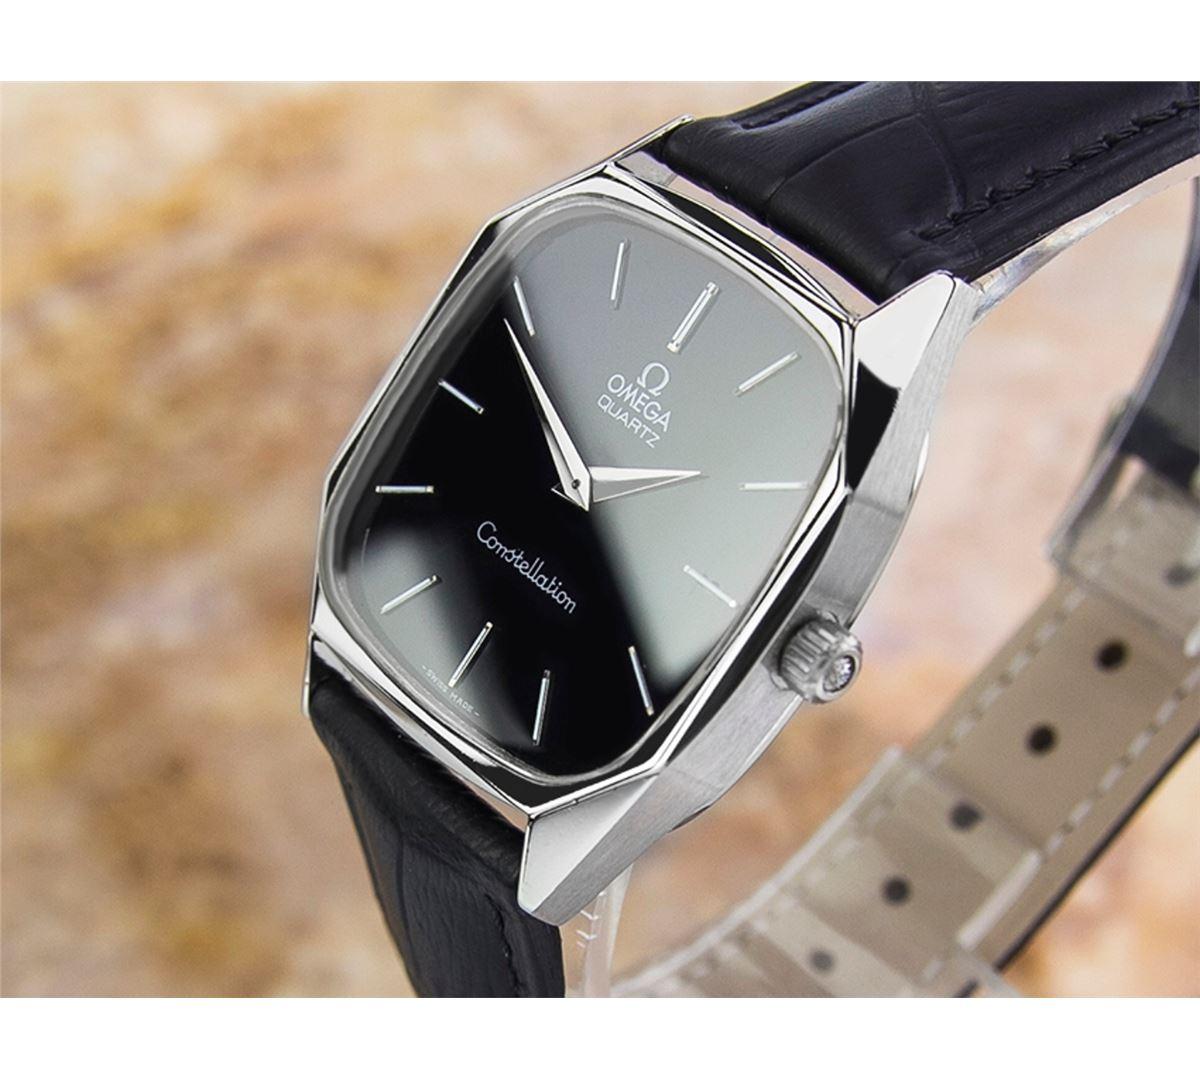 Omega Constellation Stainless Steel Quartz Watch